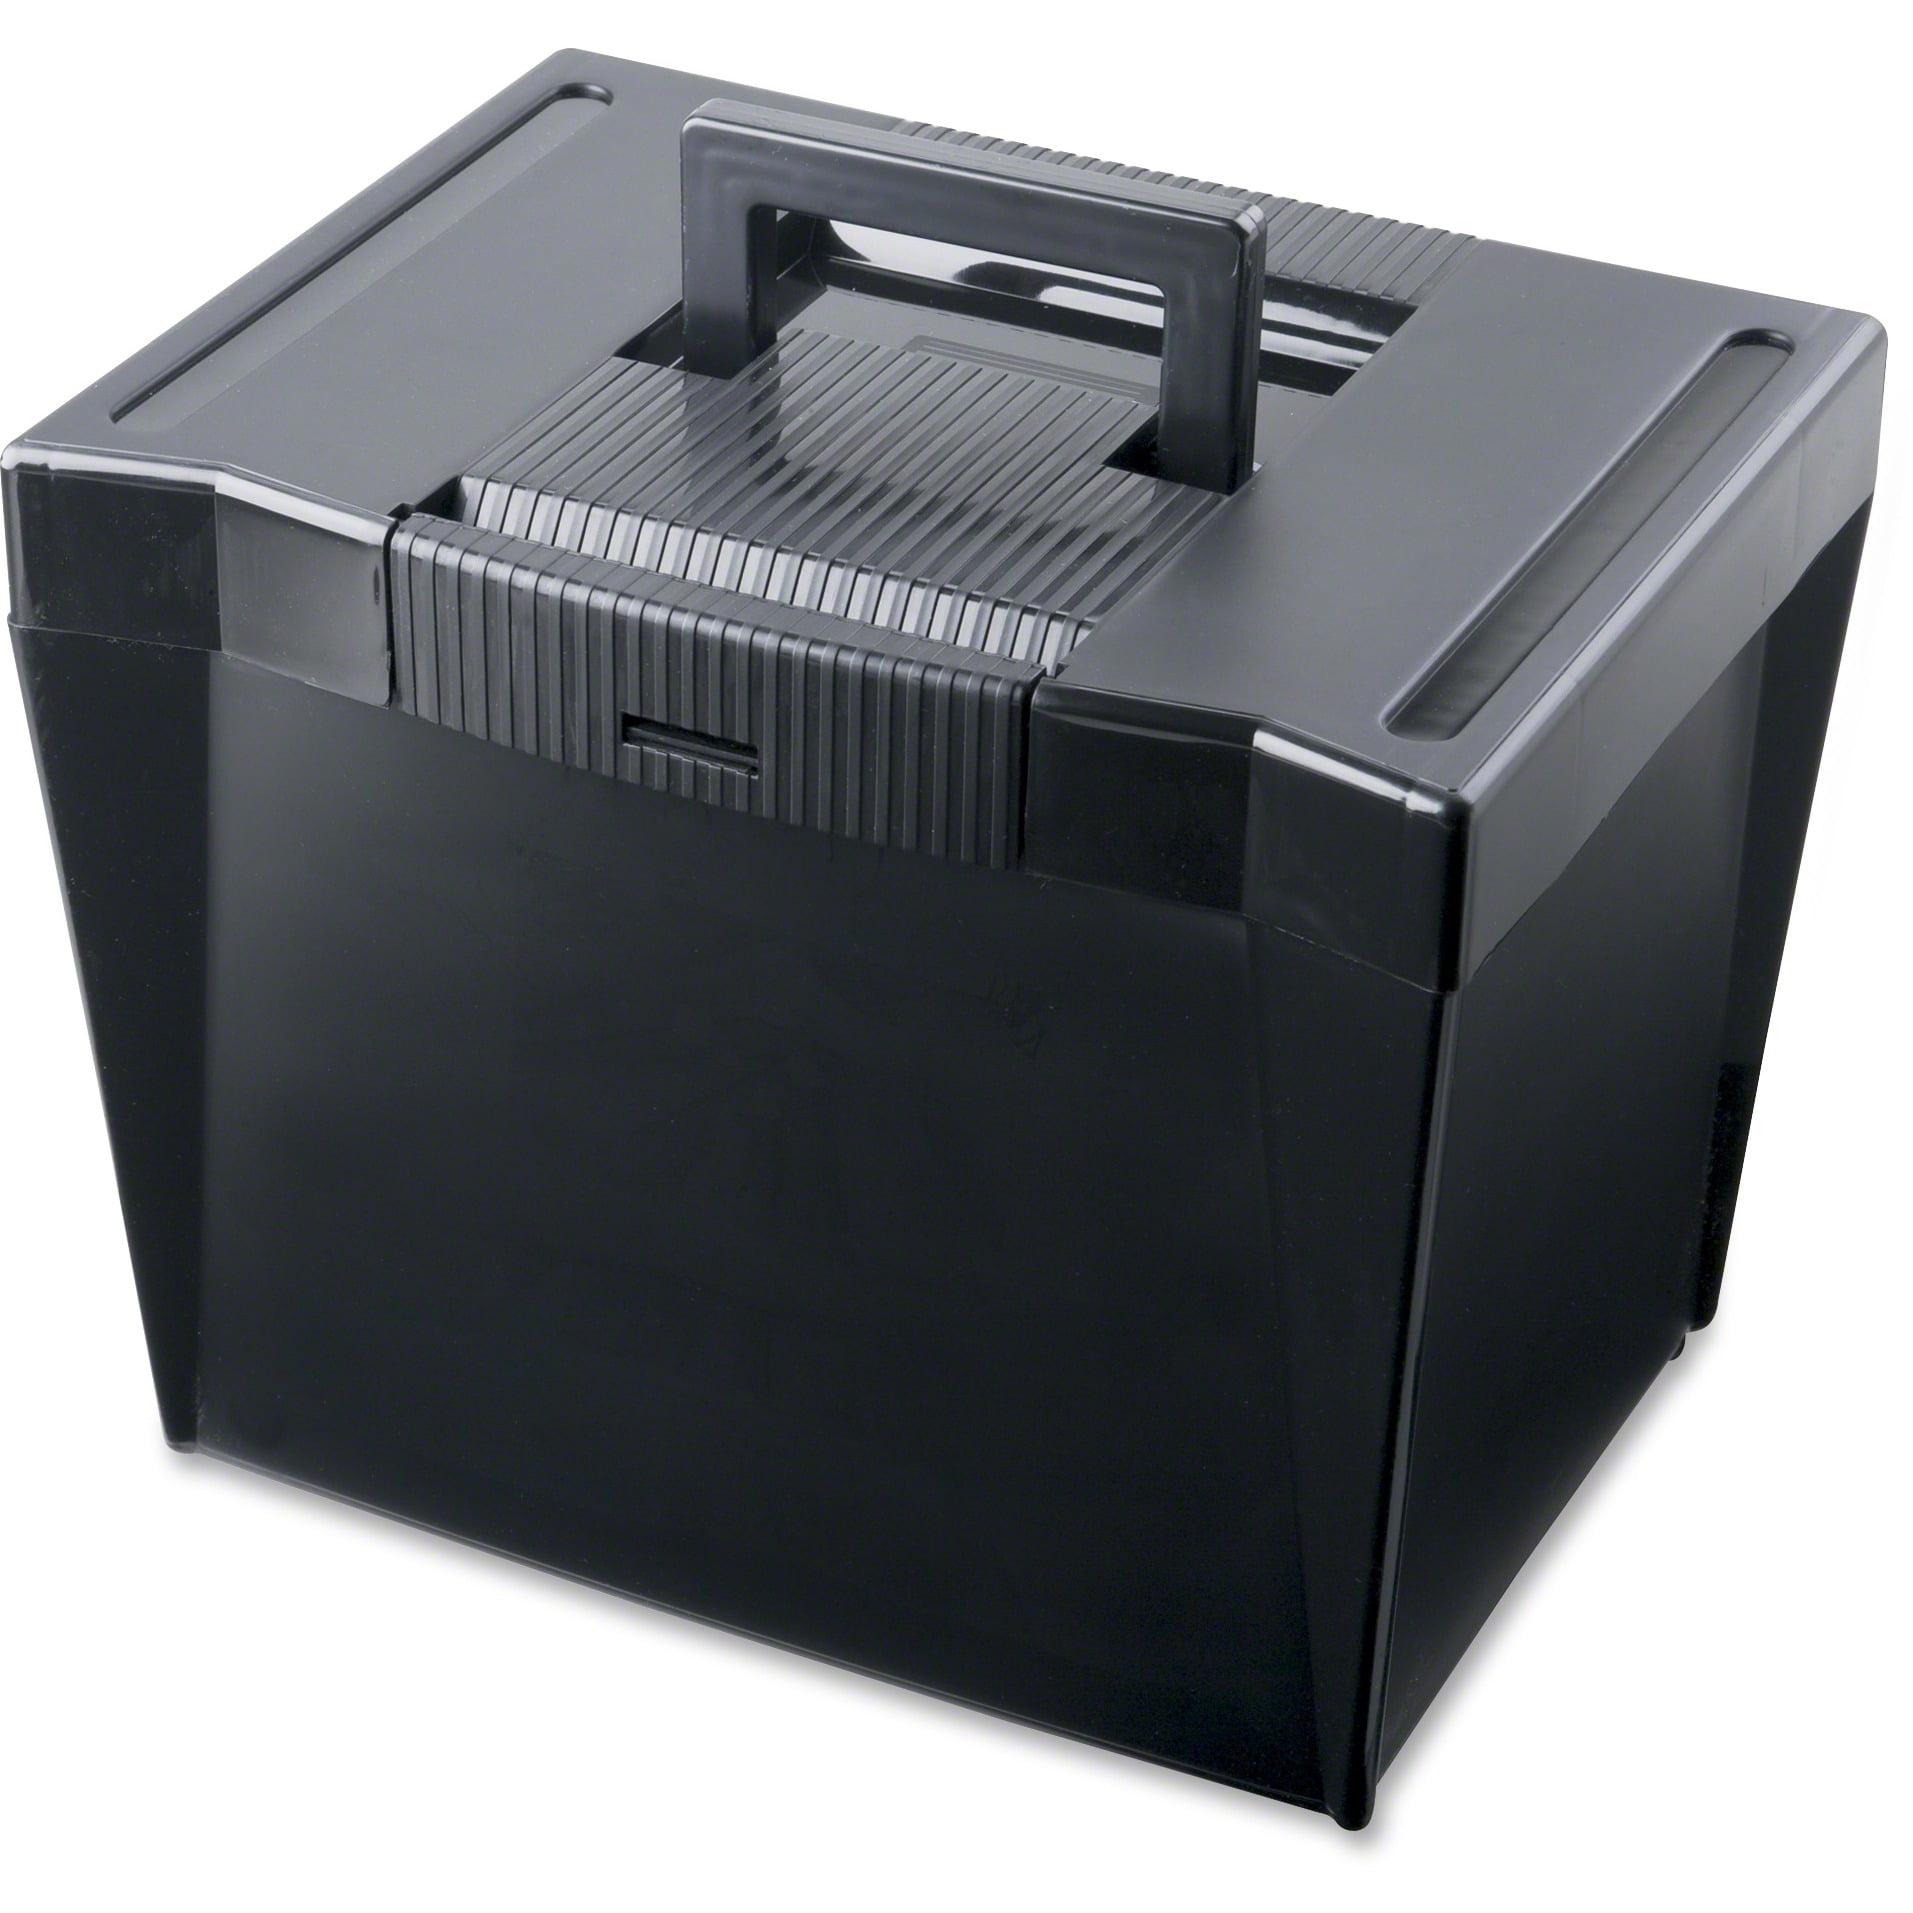 Pendaflex Economy File Box